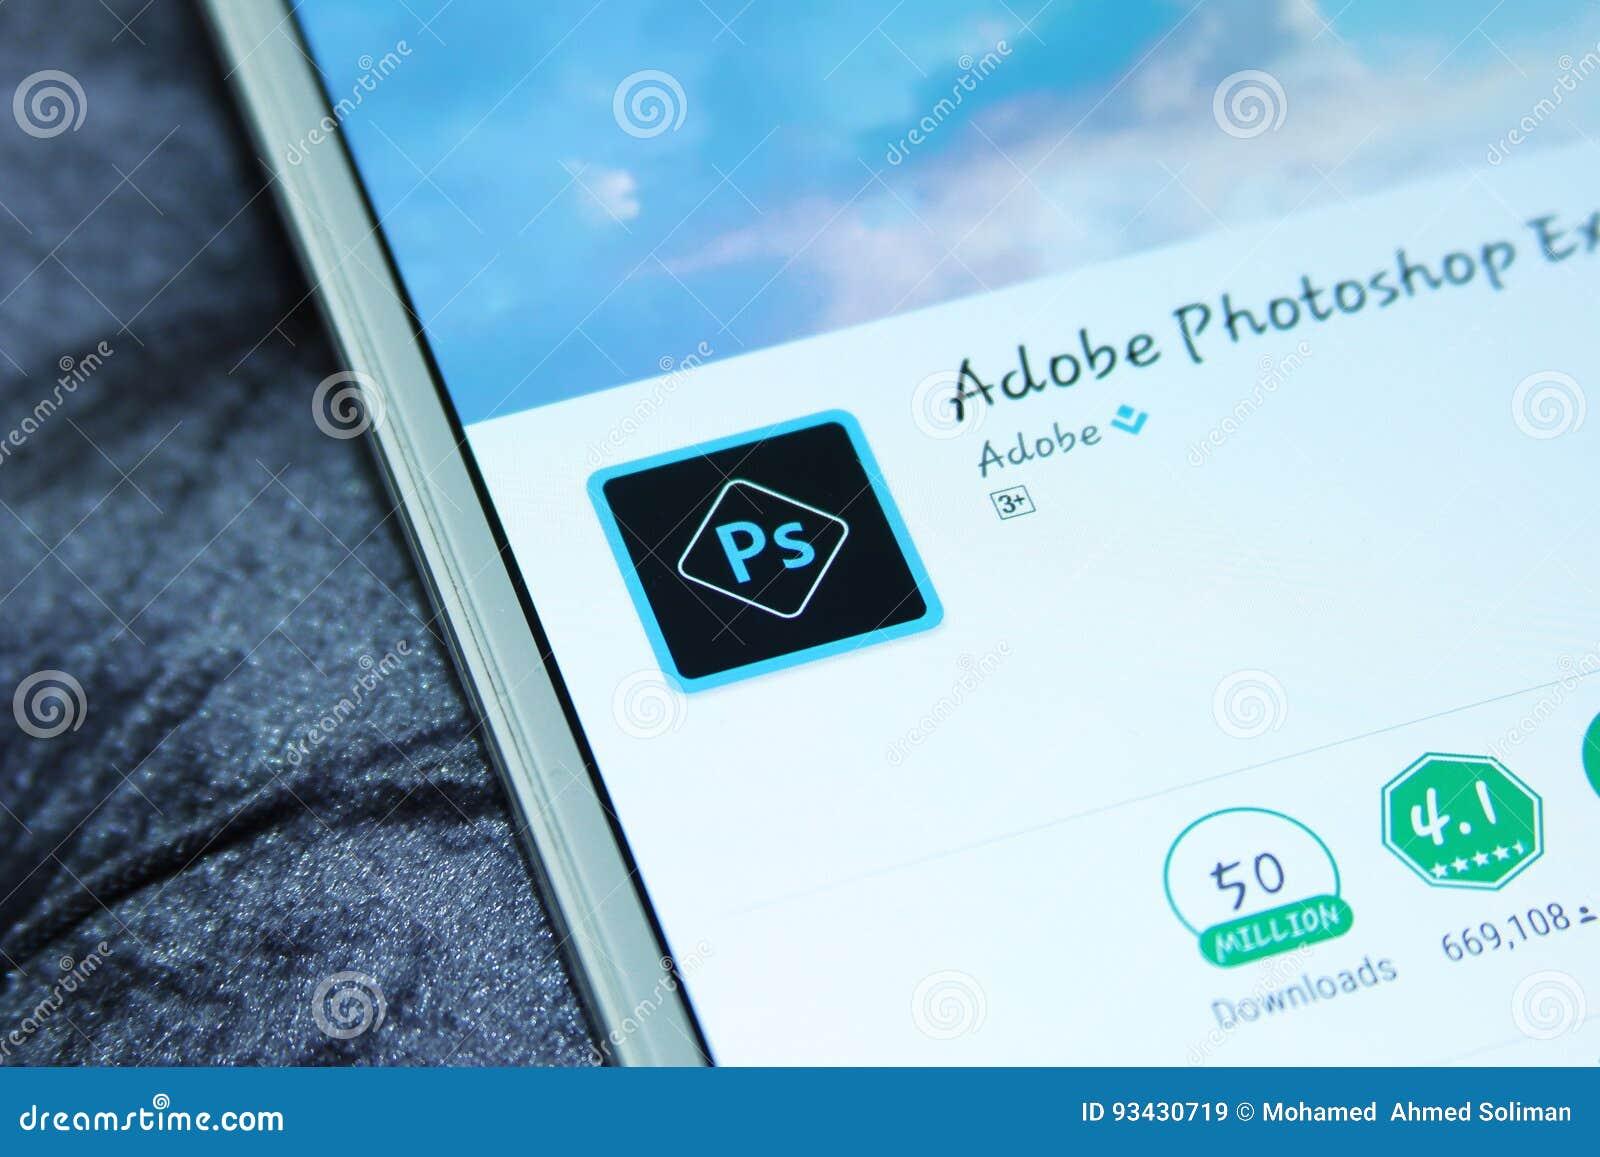 Adobe photoshop mobile app